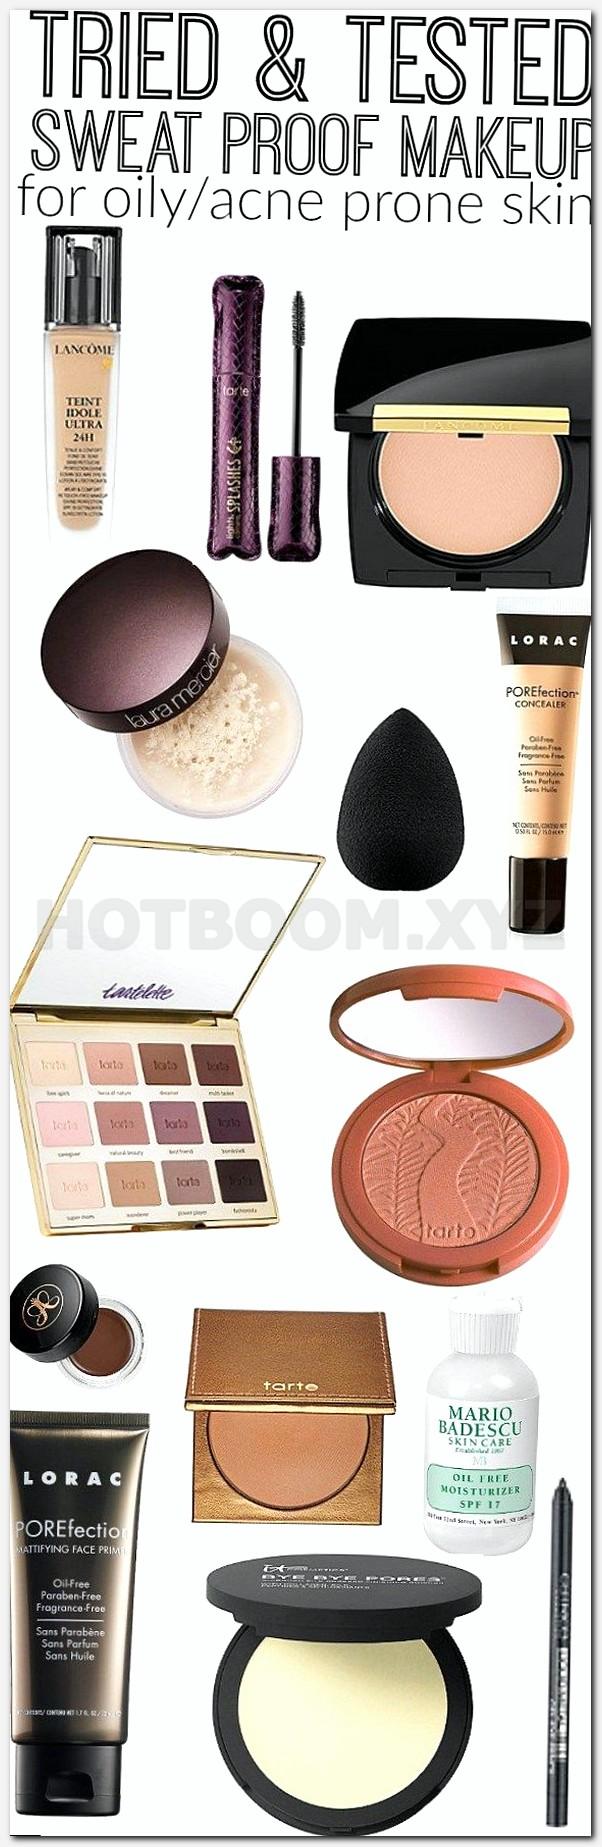 Eyeliner applying videos next full moon nyc model makeup tips